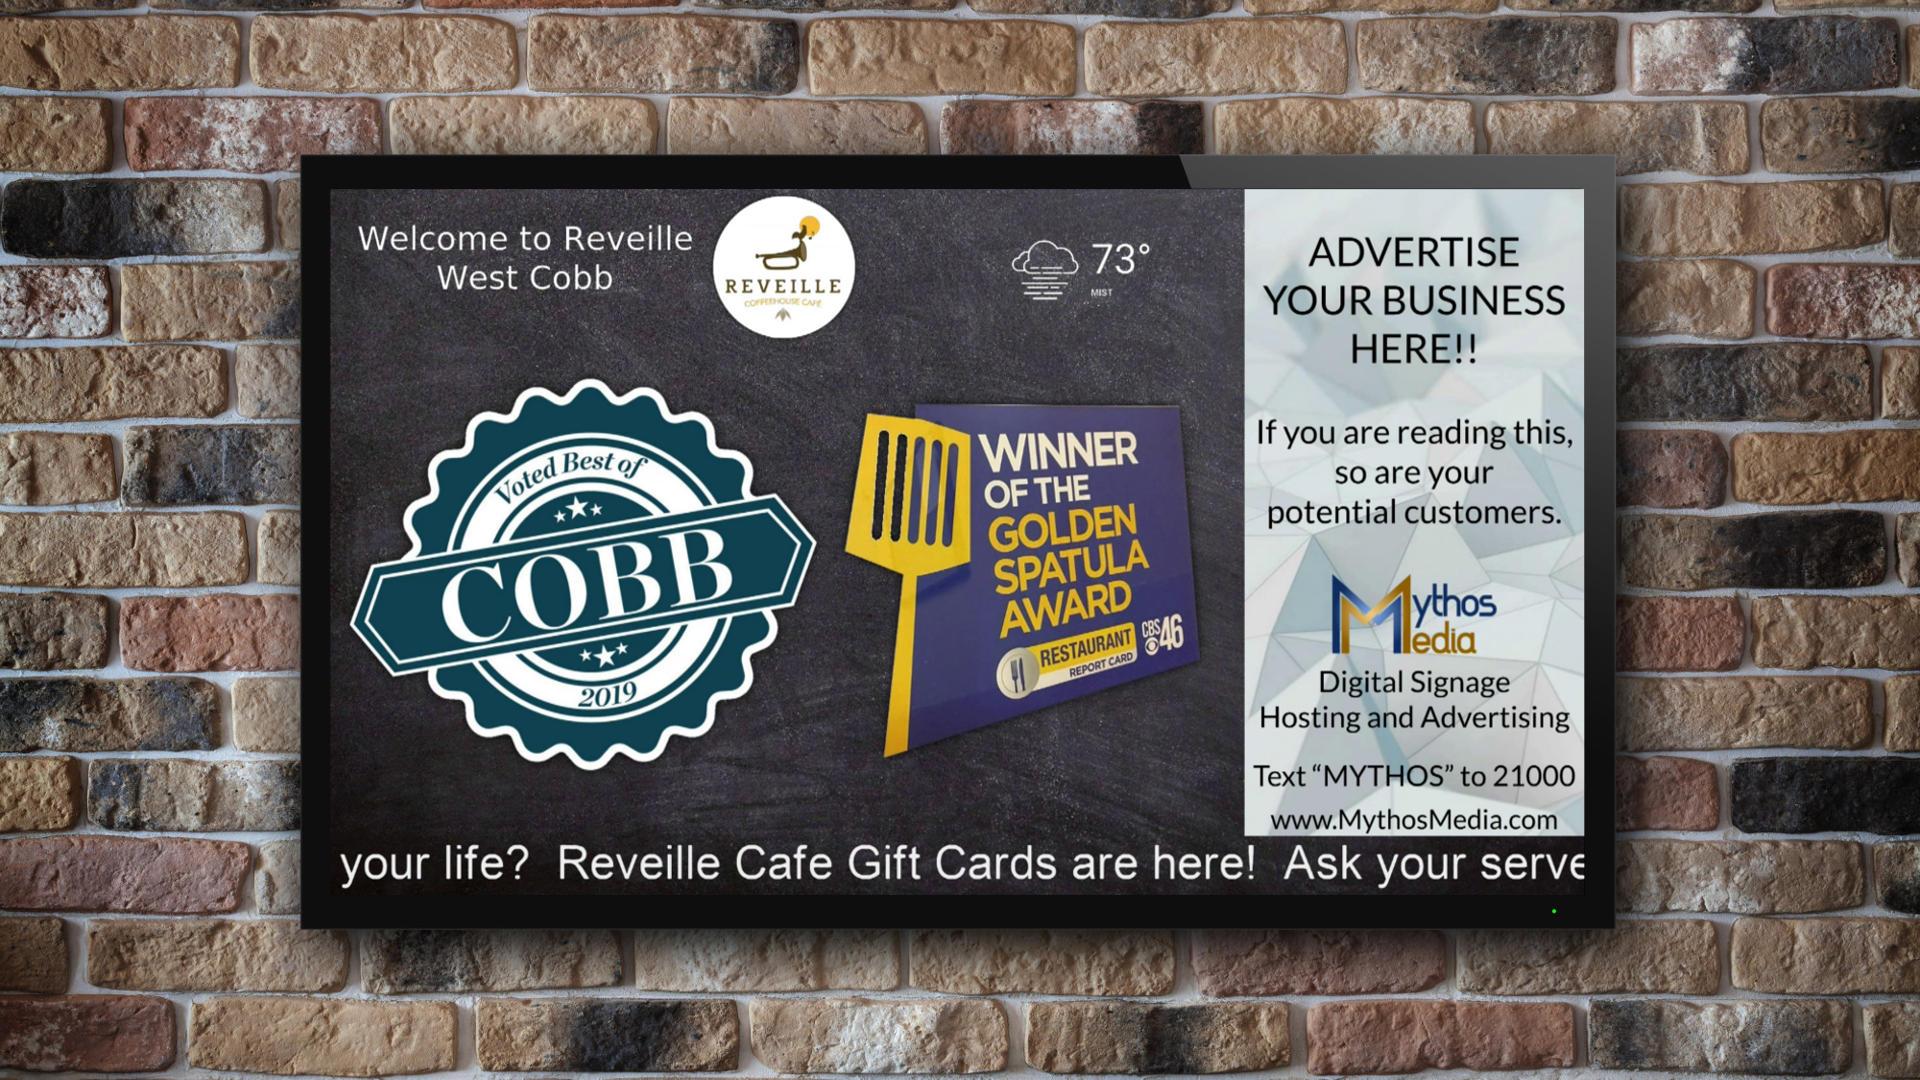 Mythos Media Digital Signage at Reveille Cafe, Best of Cobb, Golden Spatula Awards